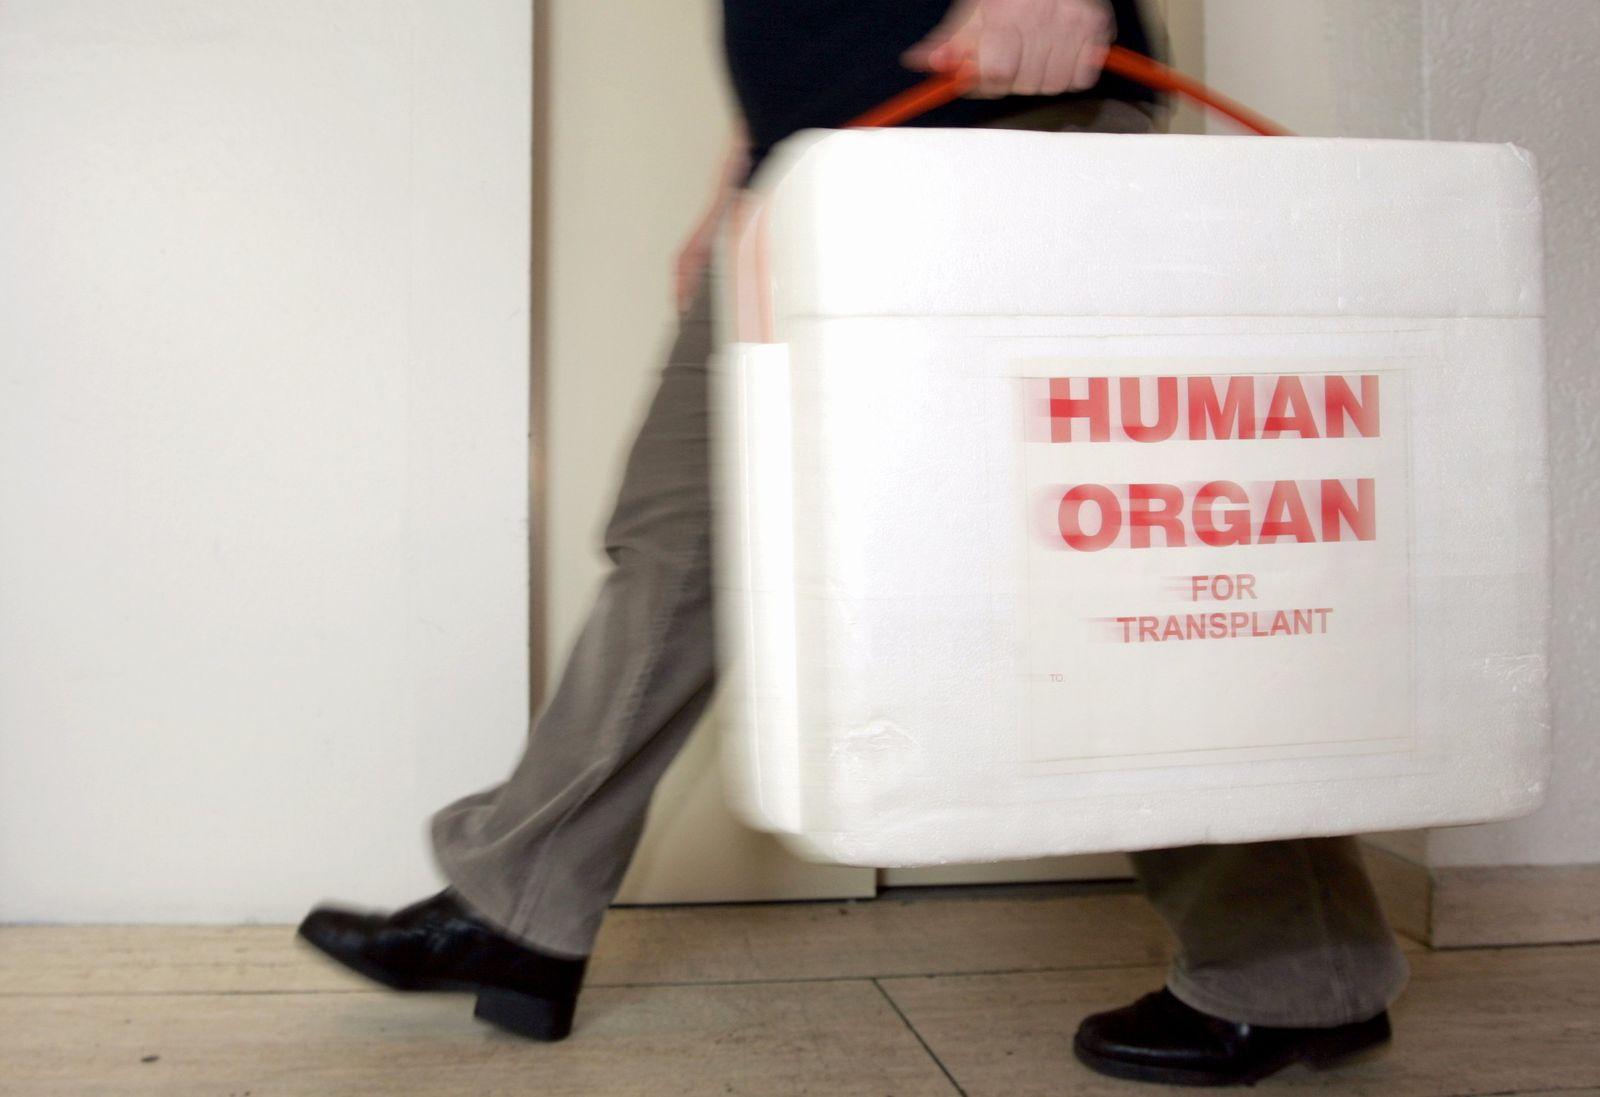 Rekord bei Organspenden